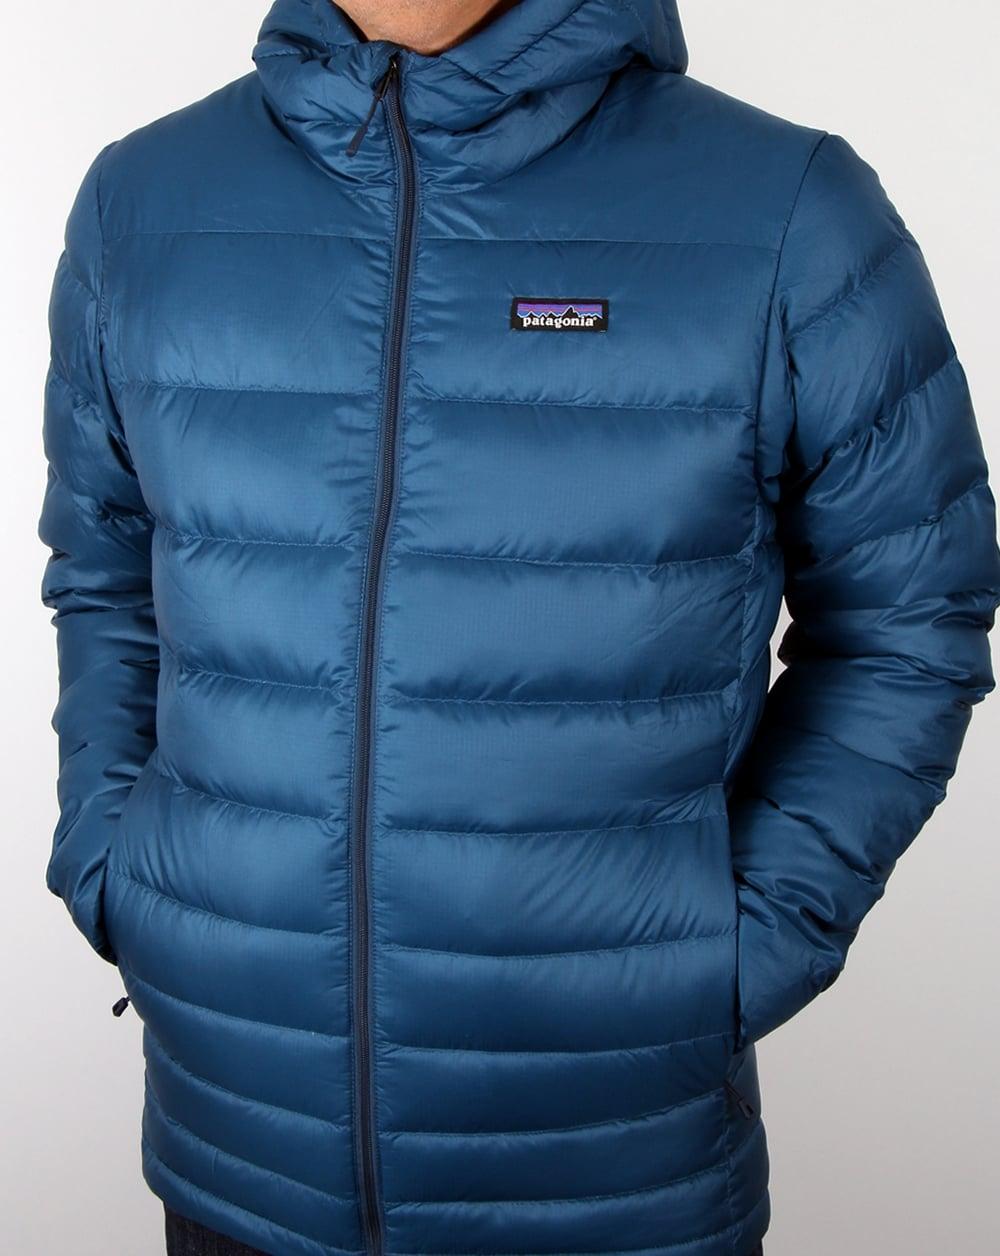 Patagonia Hi Loft Down Hooded Jacket Glass Blue